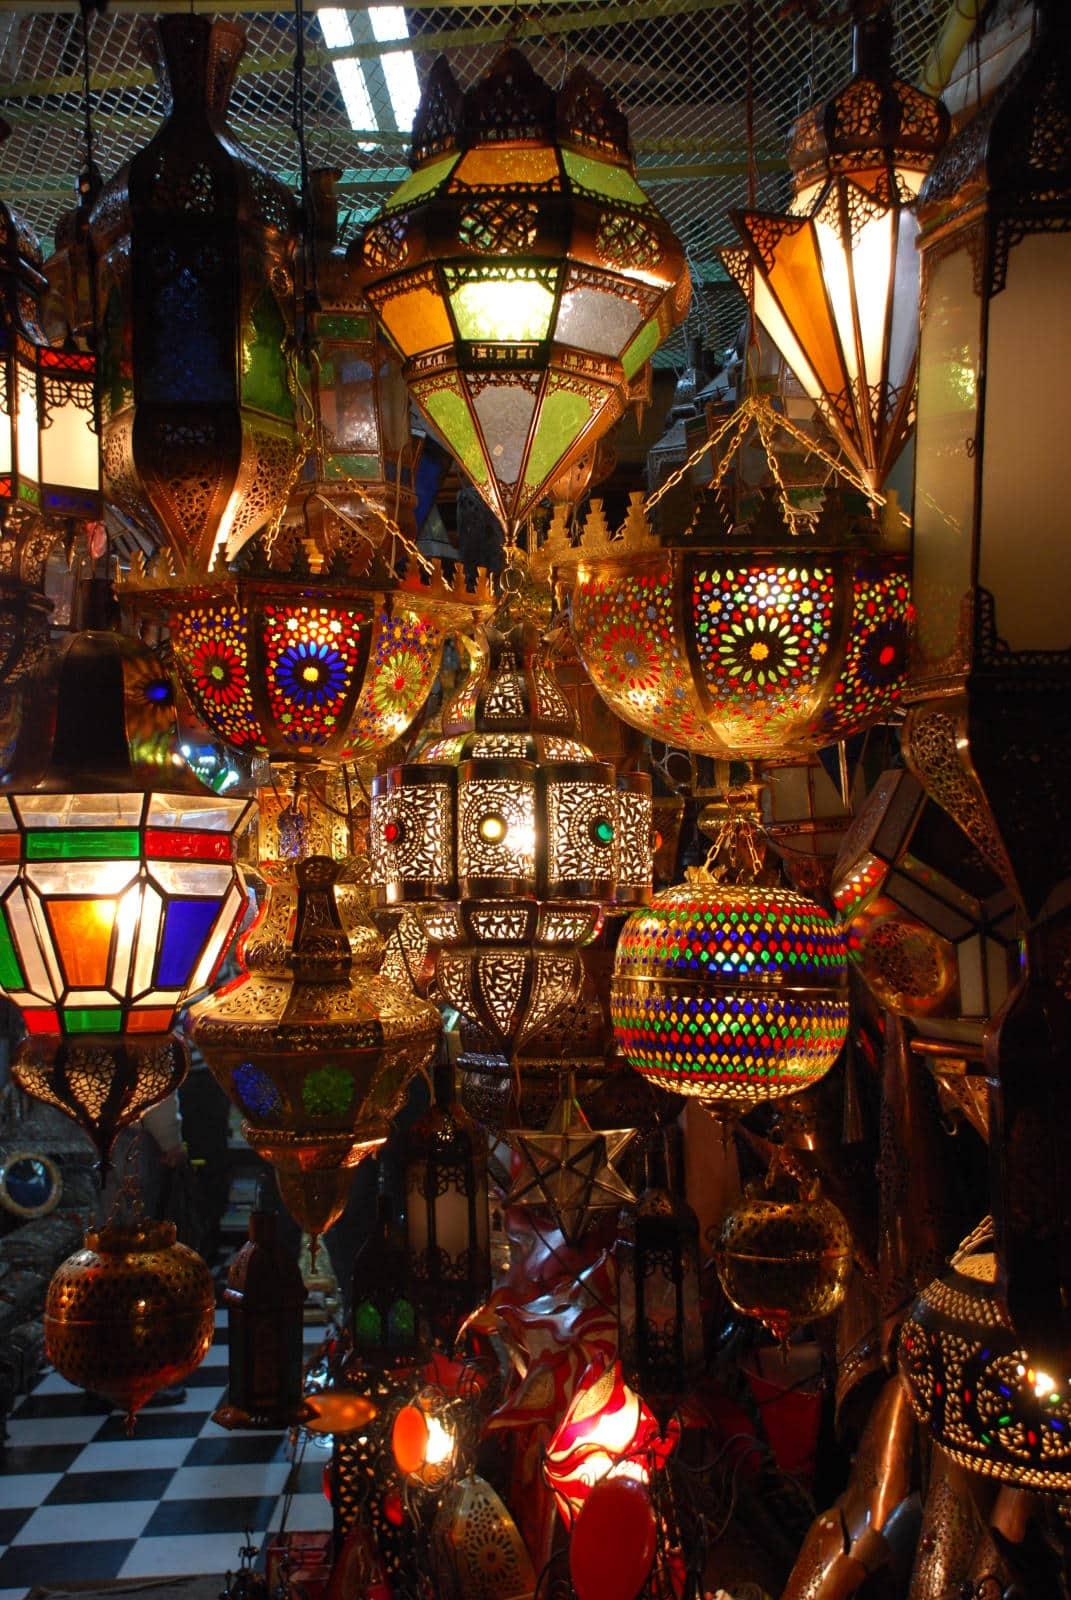 Morocco; Marrakech Souk